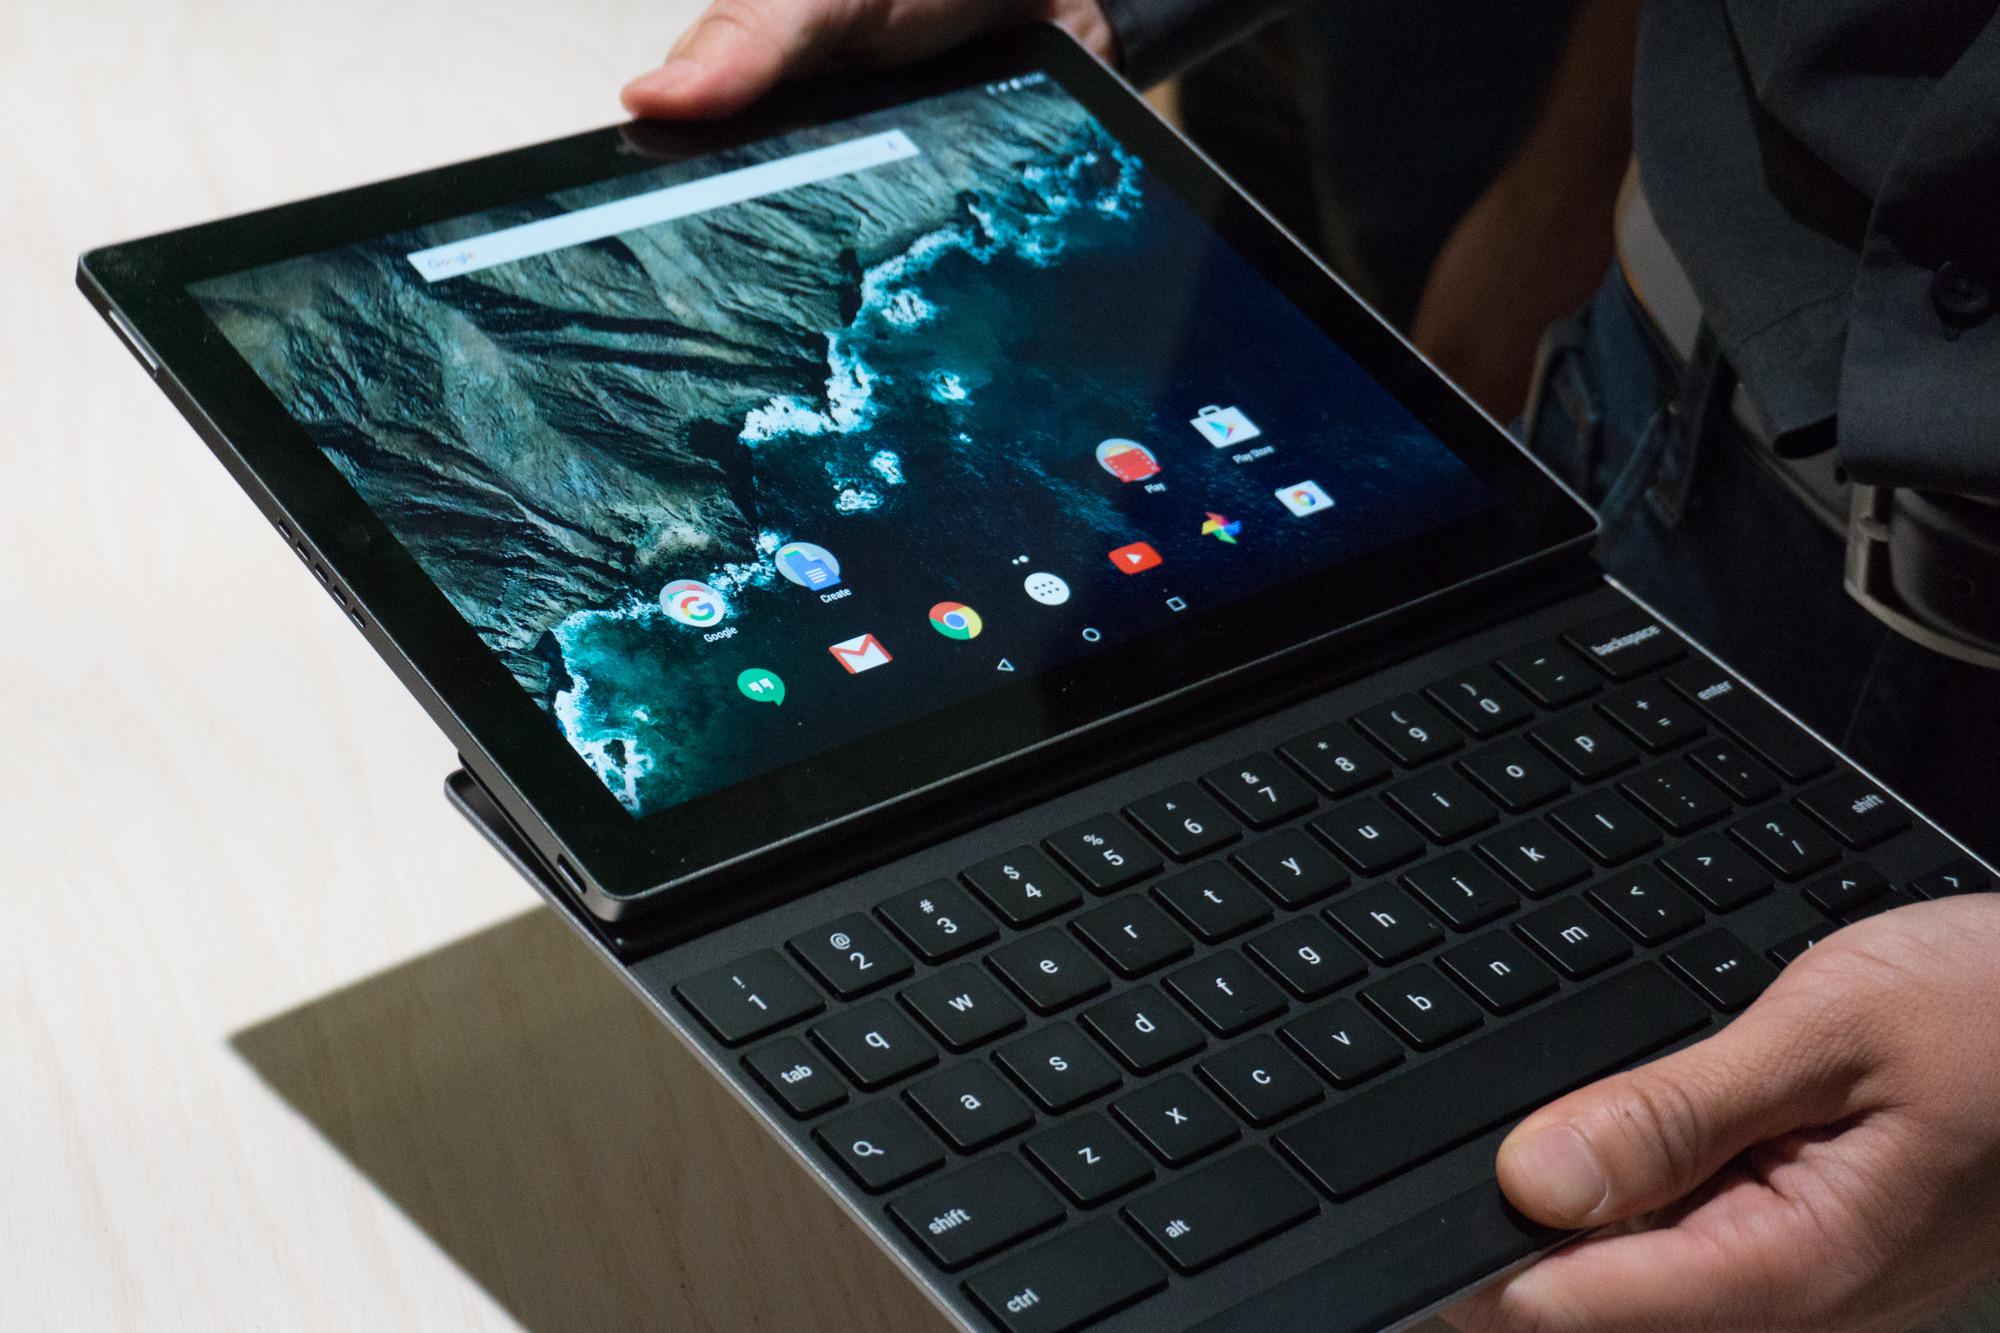 Google Pixel C Keyboard hands on